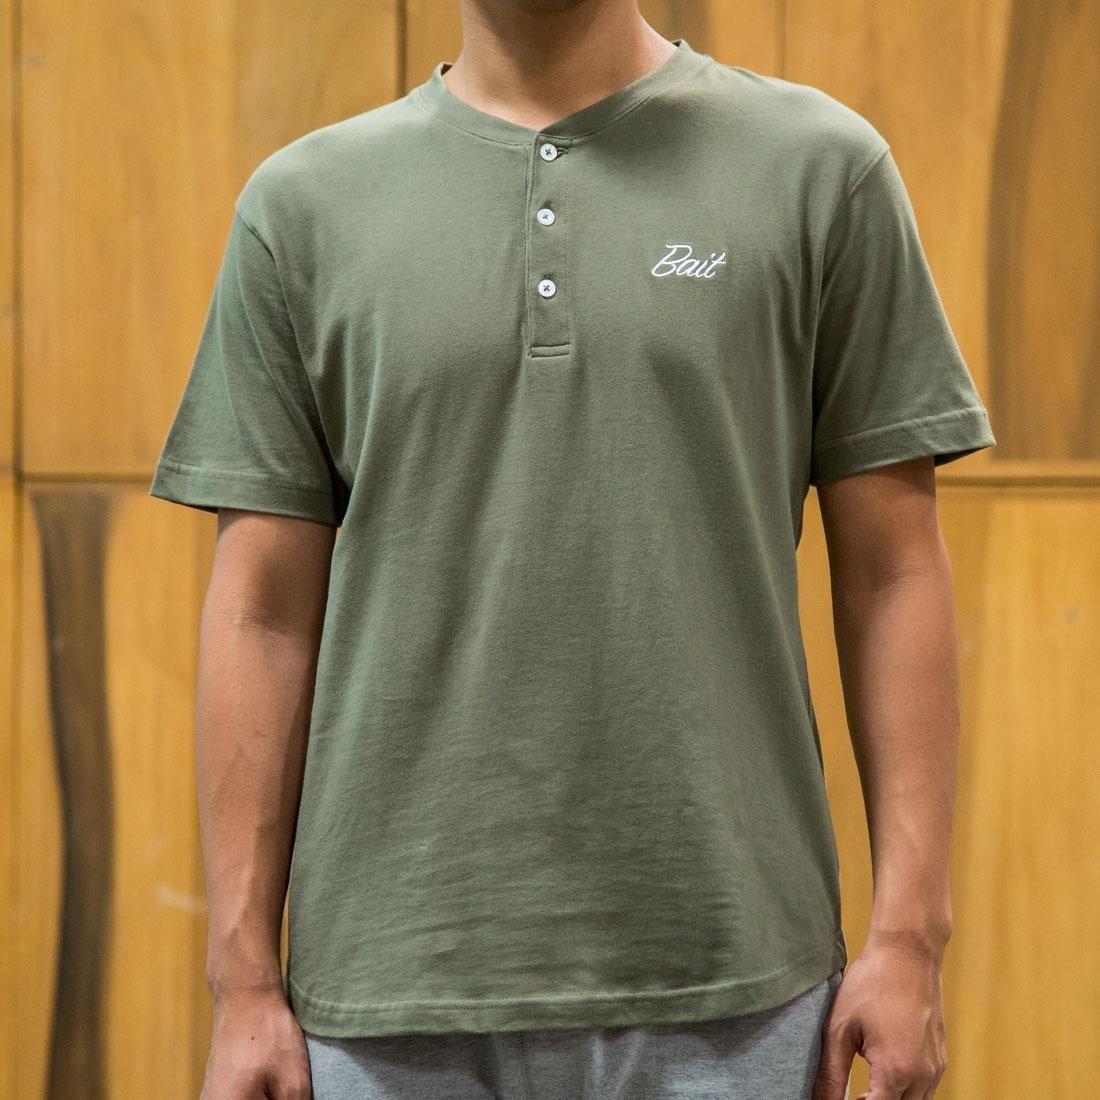 BAIT Men Core Henley Tee (green / military green)